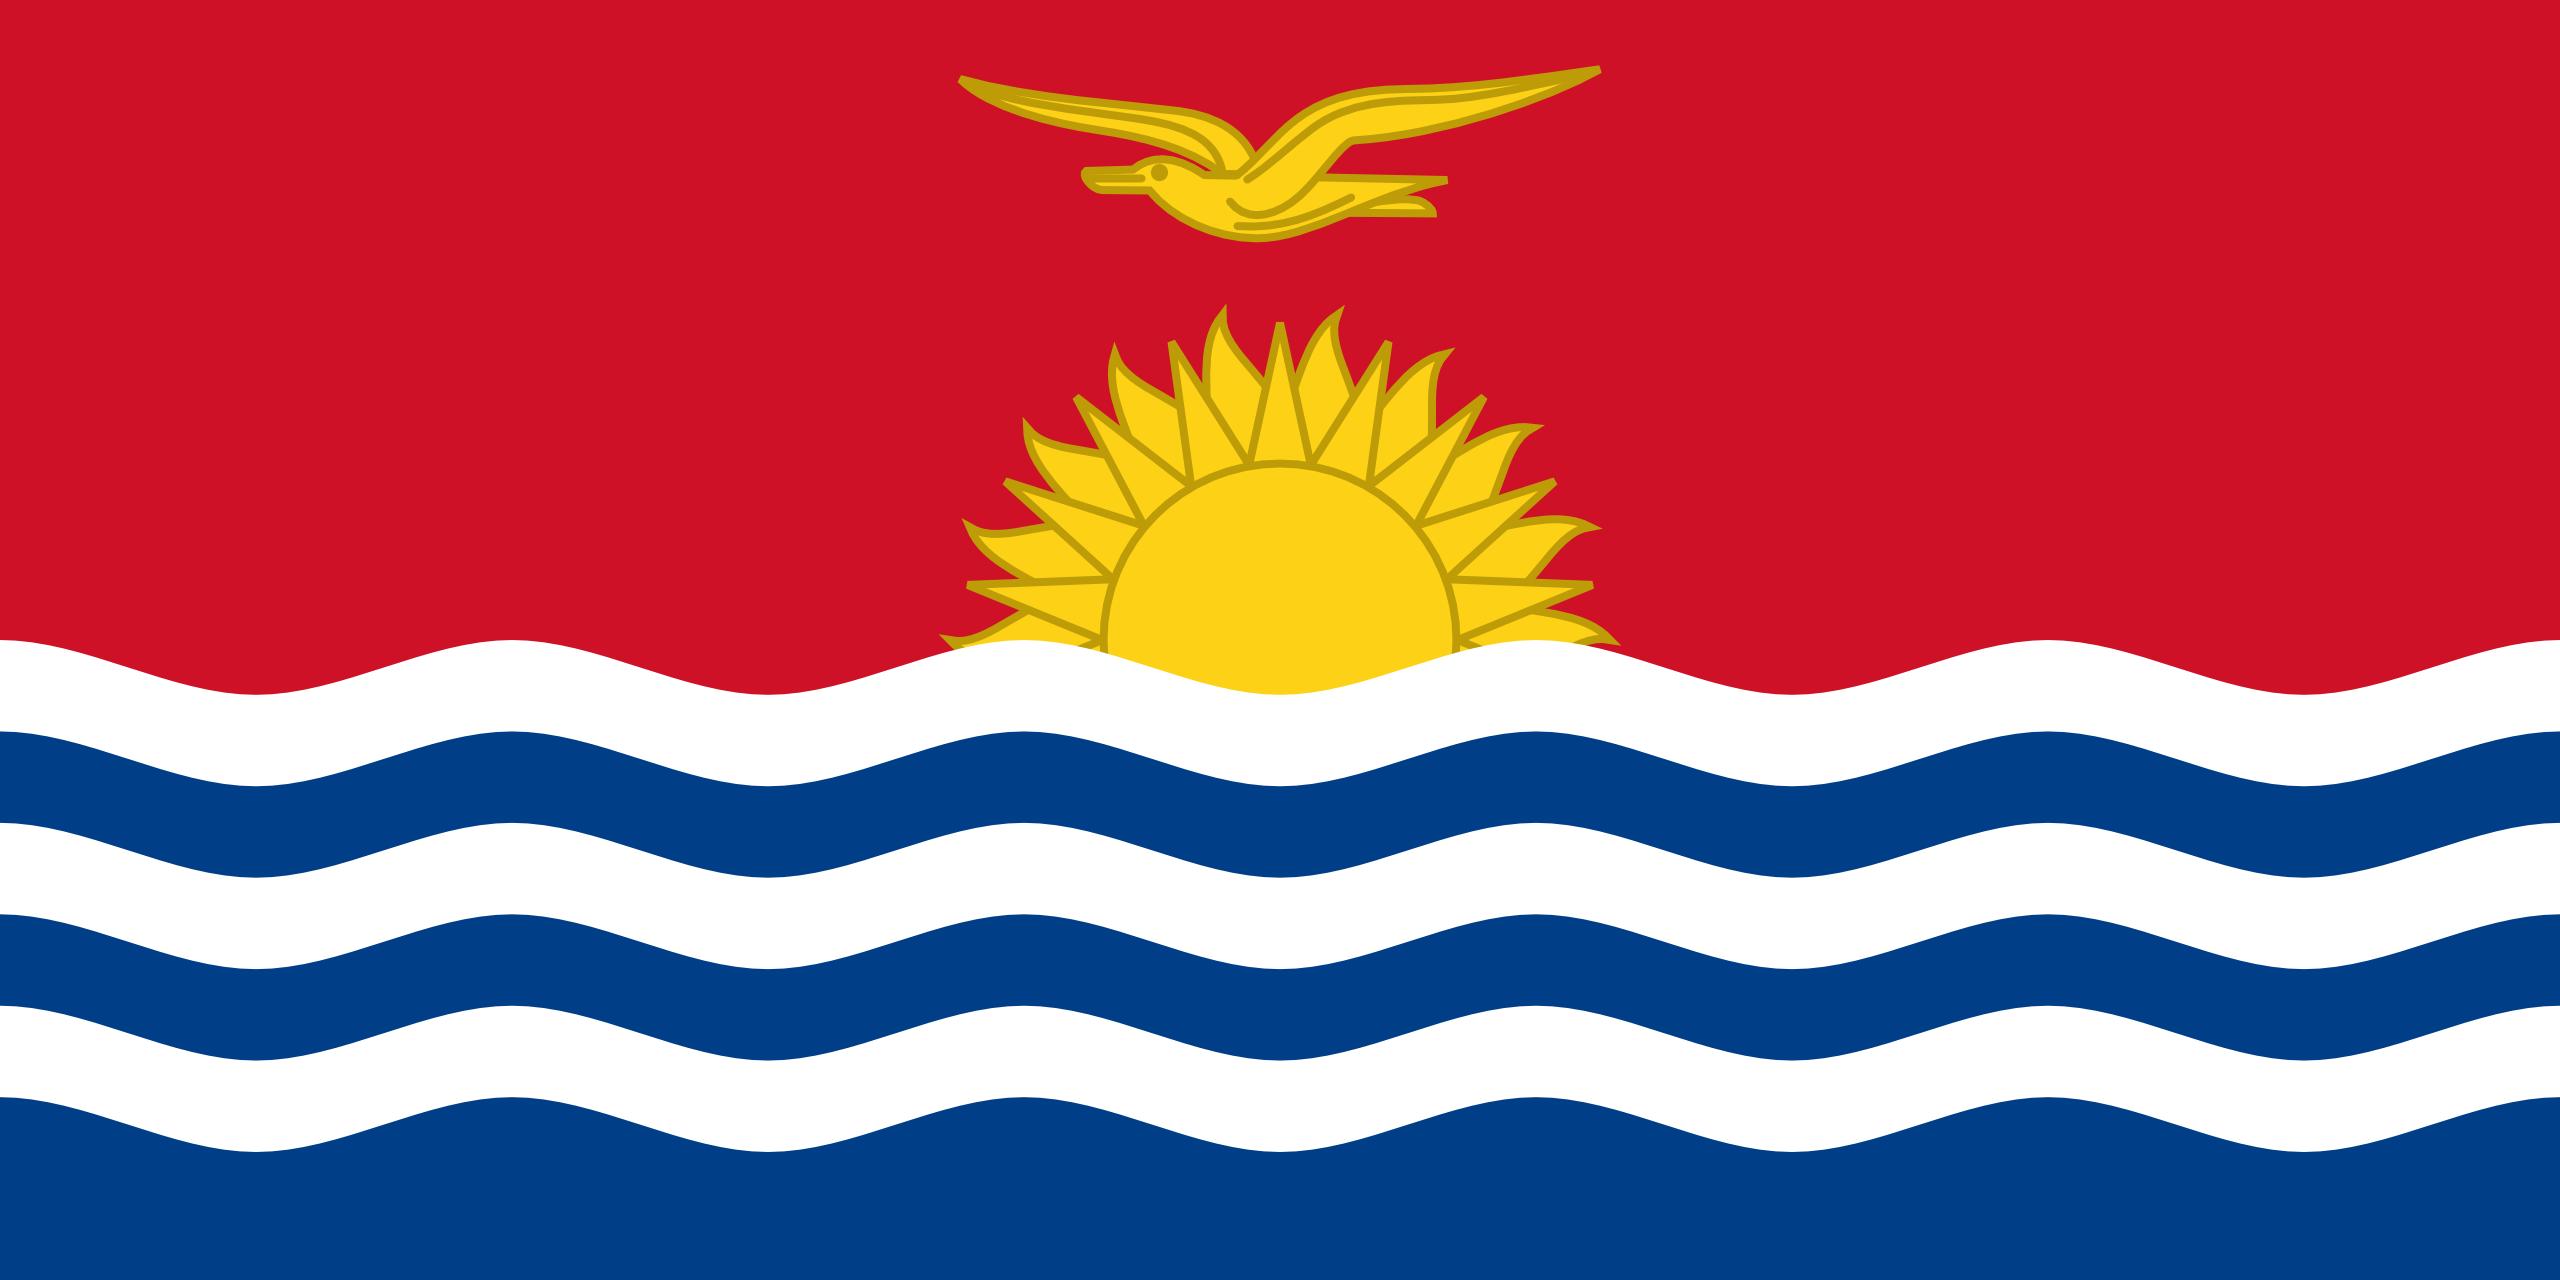 Kiribati, país, Brasão de armas, logotipo, símbolo - Papéis de parede HD - Professor-falken.com